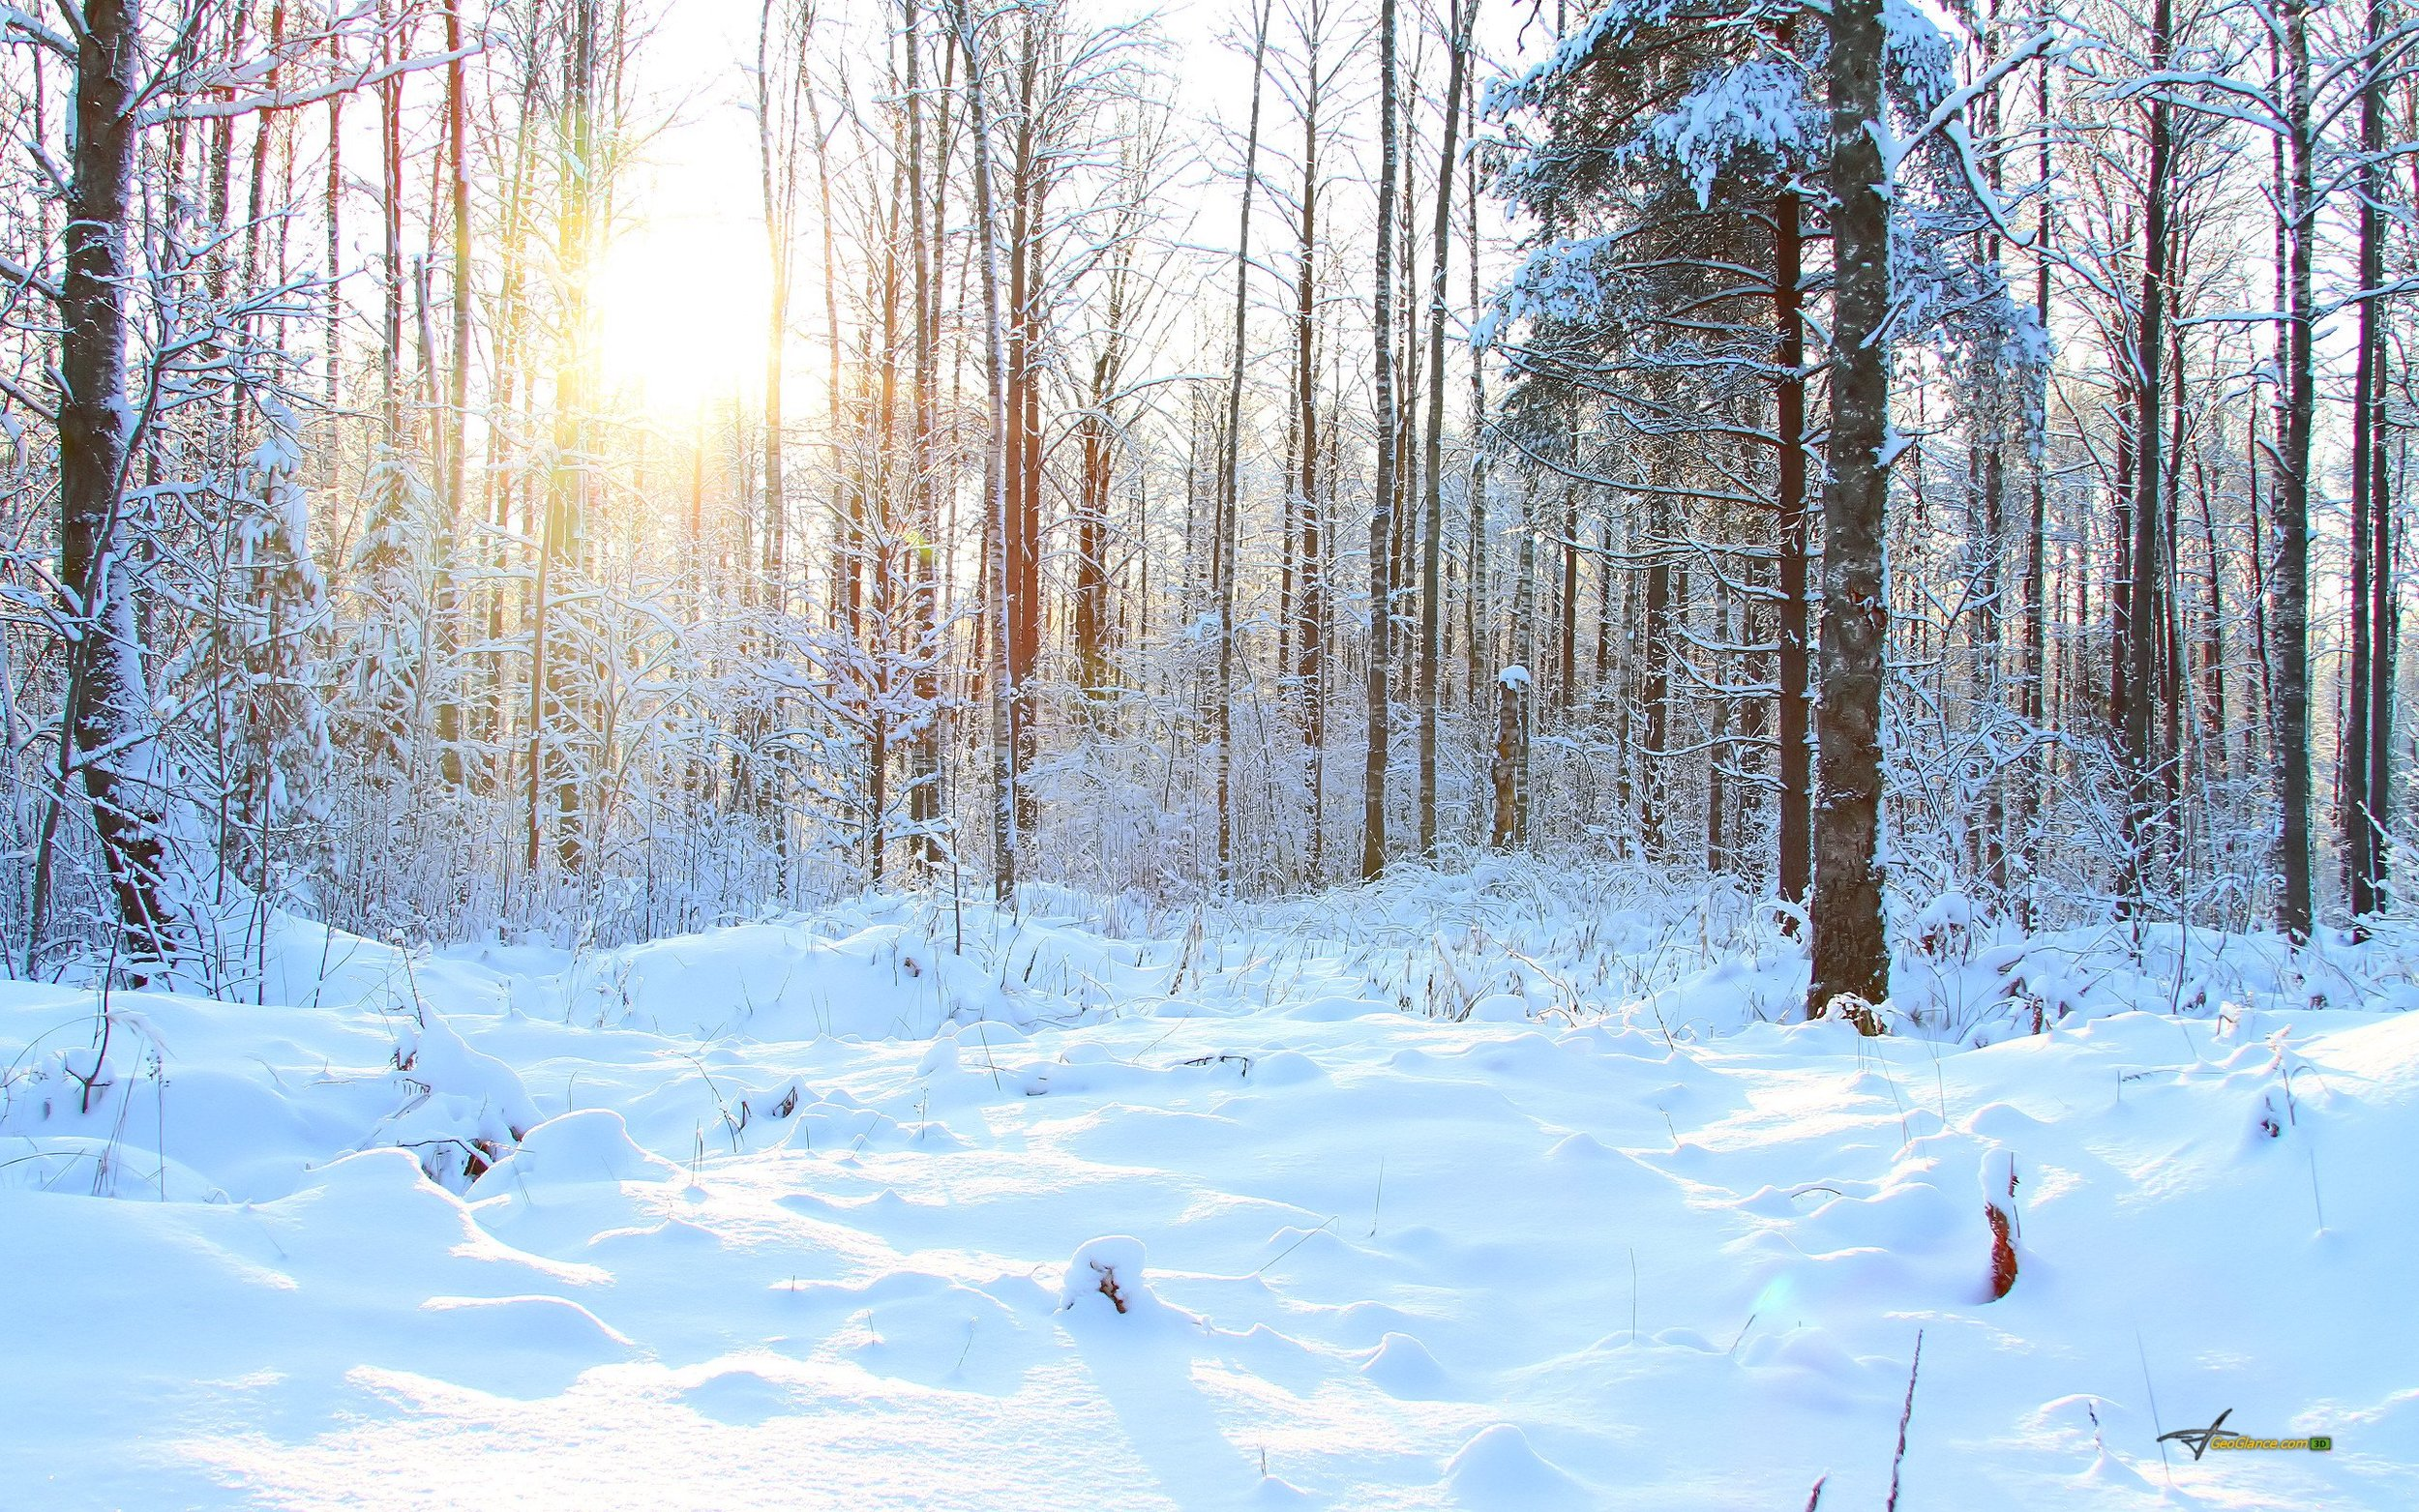 forest-tree-snow-winter-sun.jpg